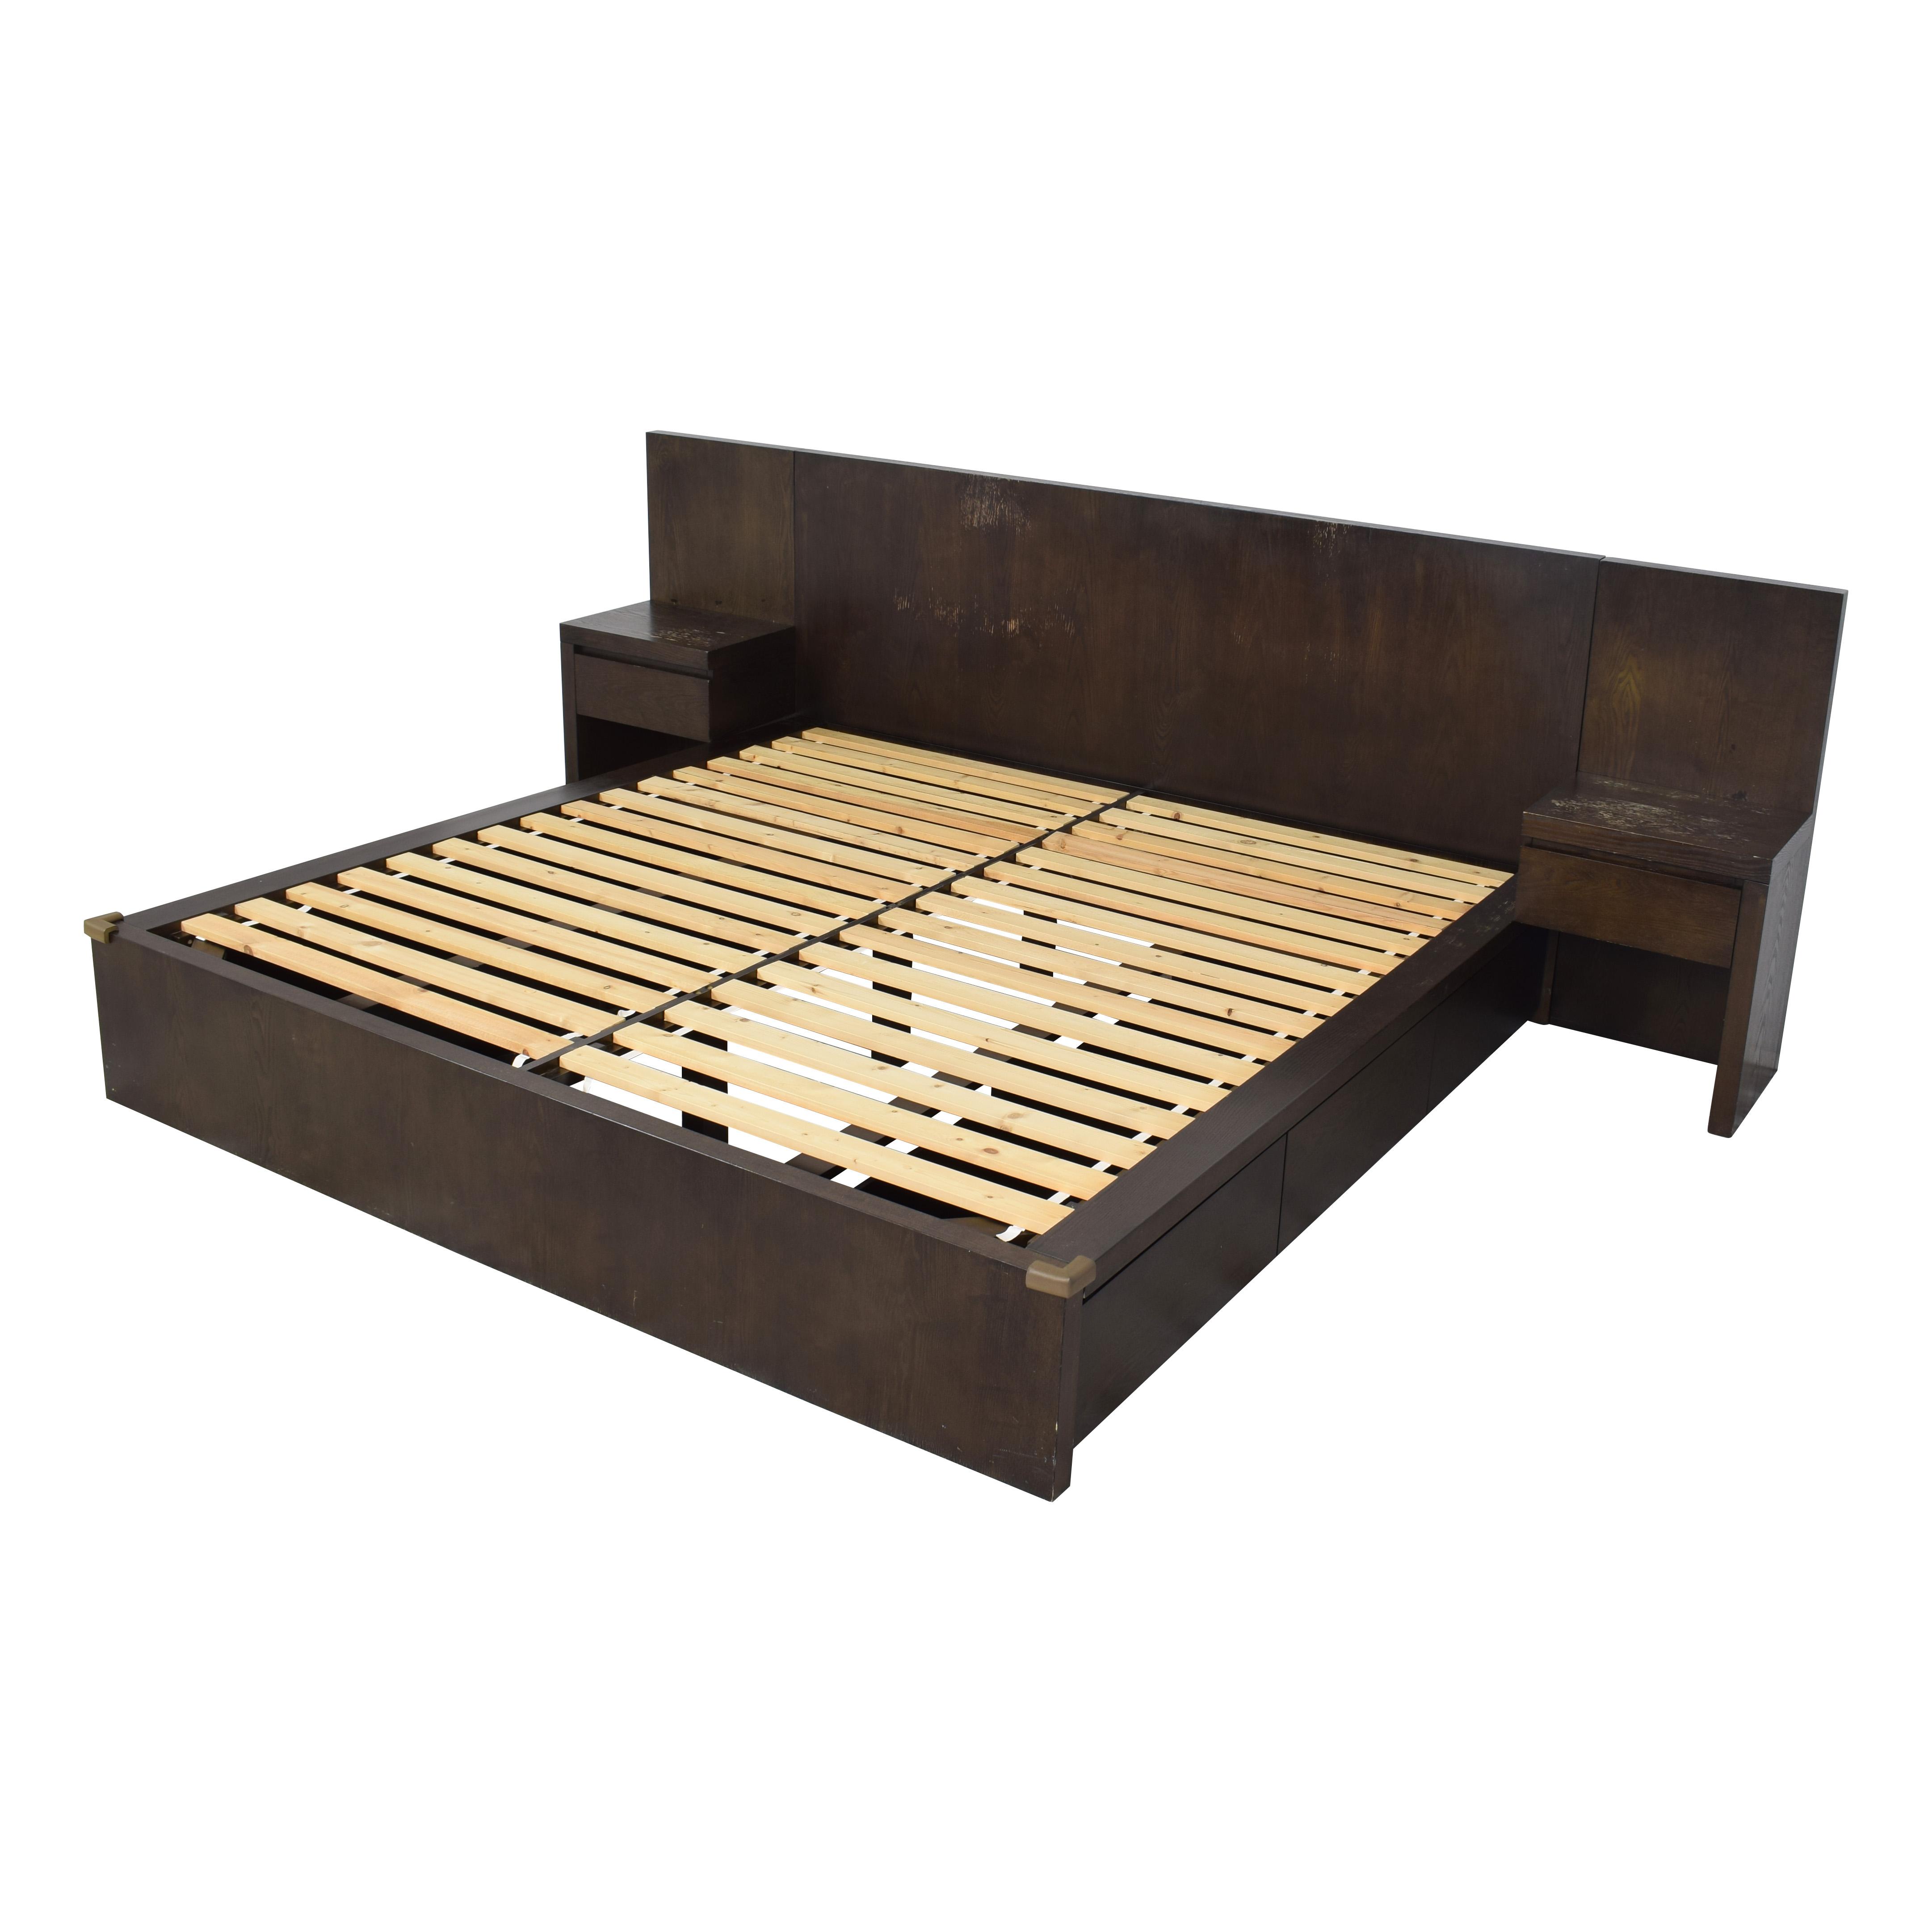 buy West Elm West Elm King Storage Bed with Nightstands online